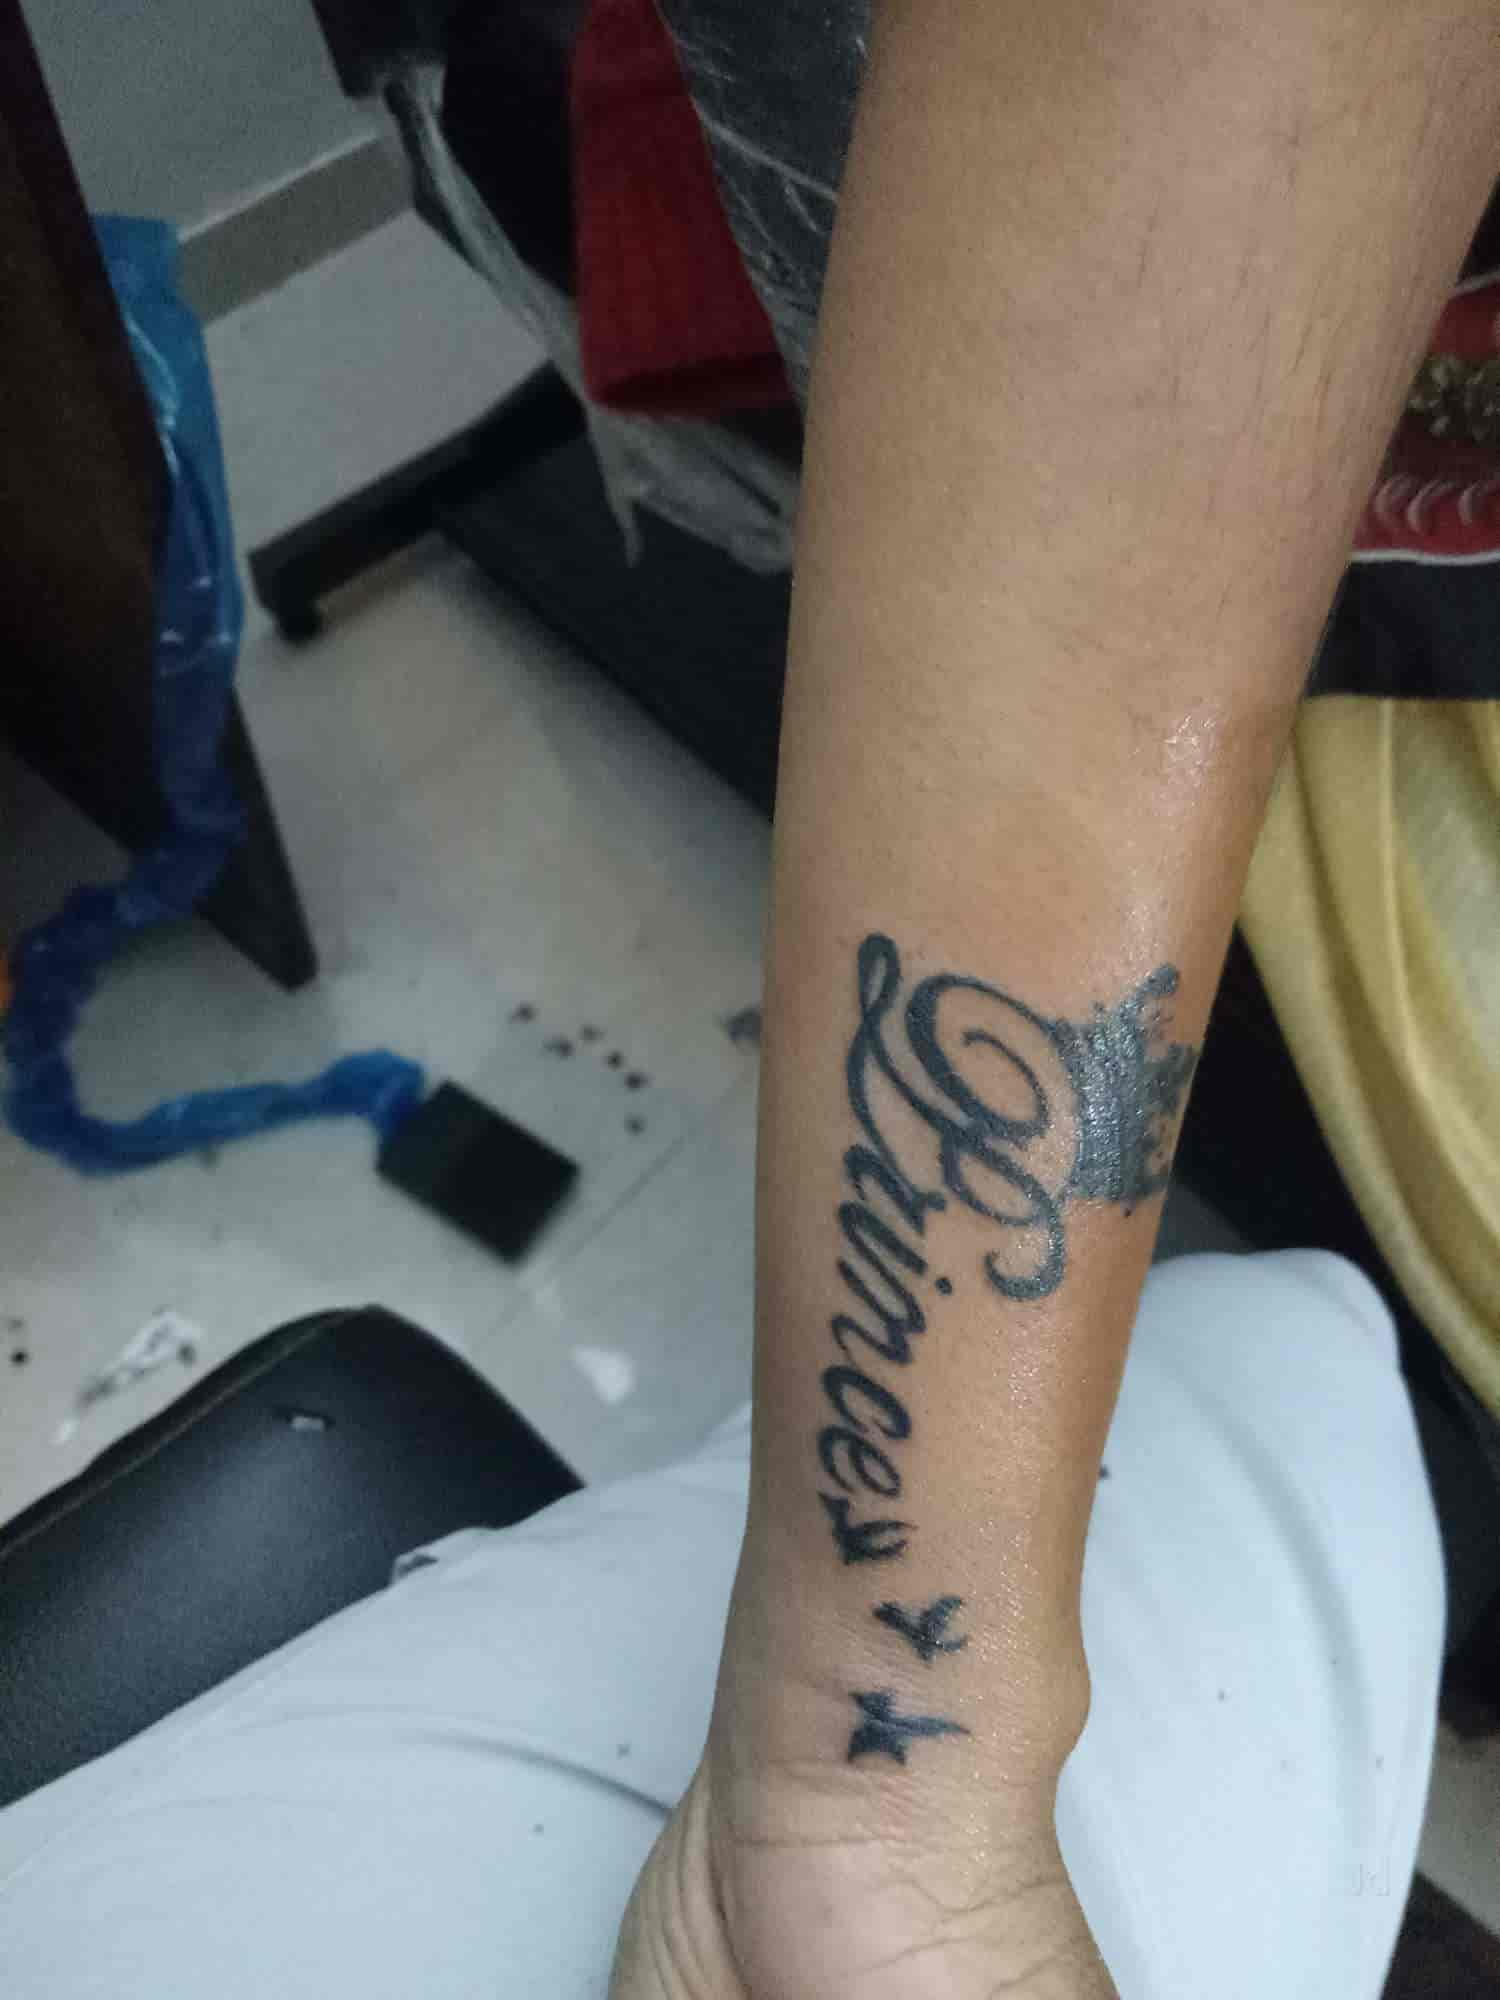 cdd9a3ea7 ... Ink Father Tattoo Studio Photos, Pipeline Road, ahmednagar - Tattoo  Artists ...